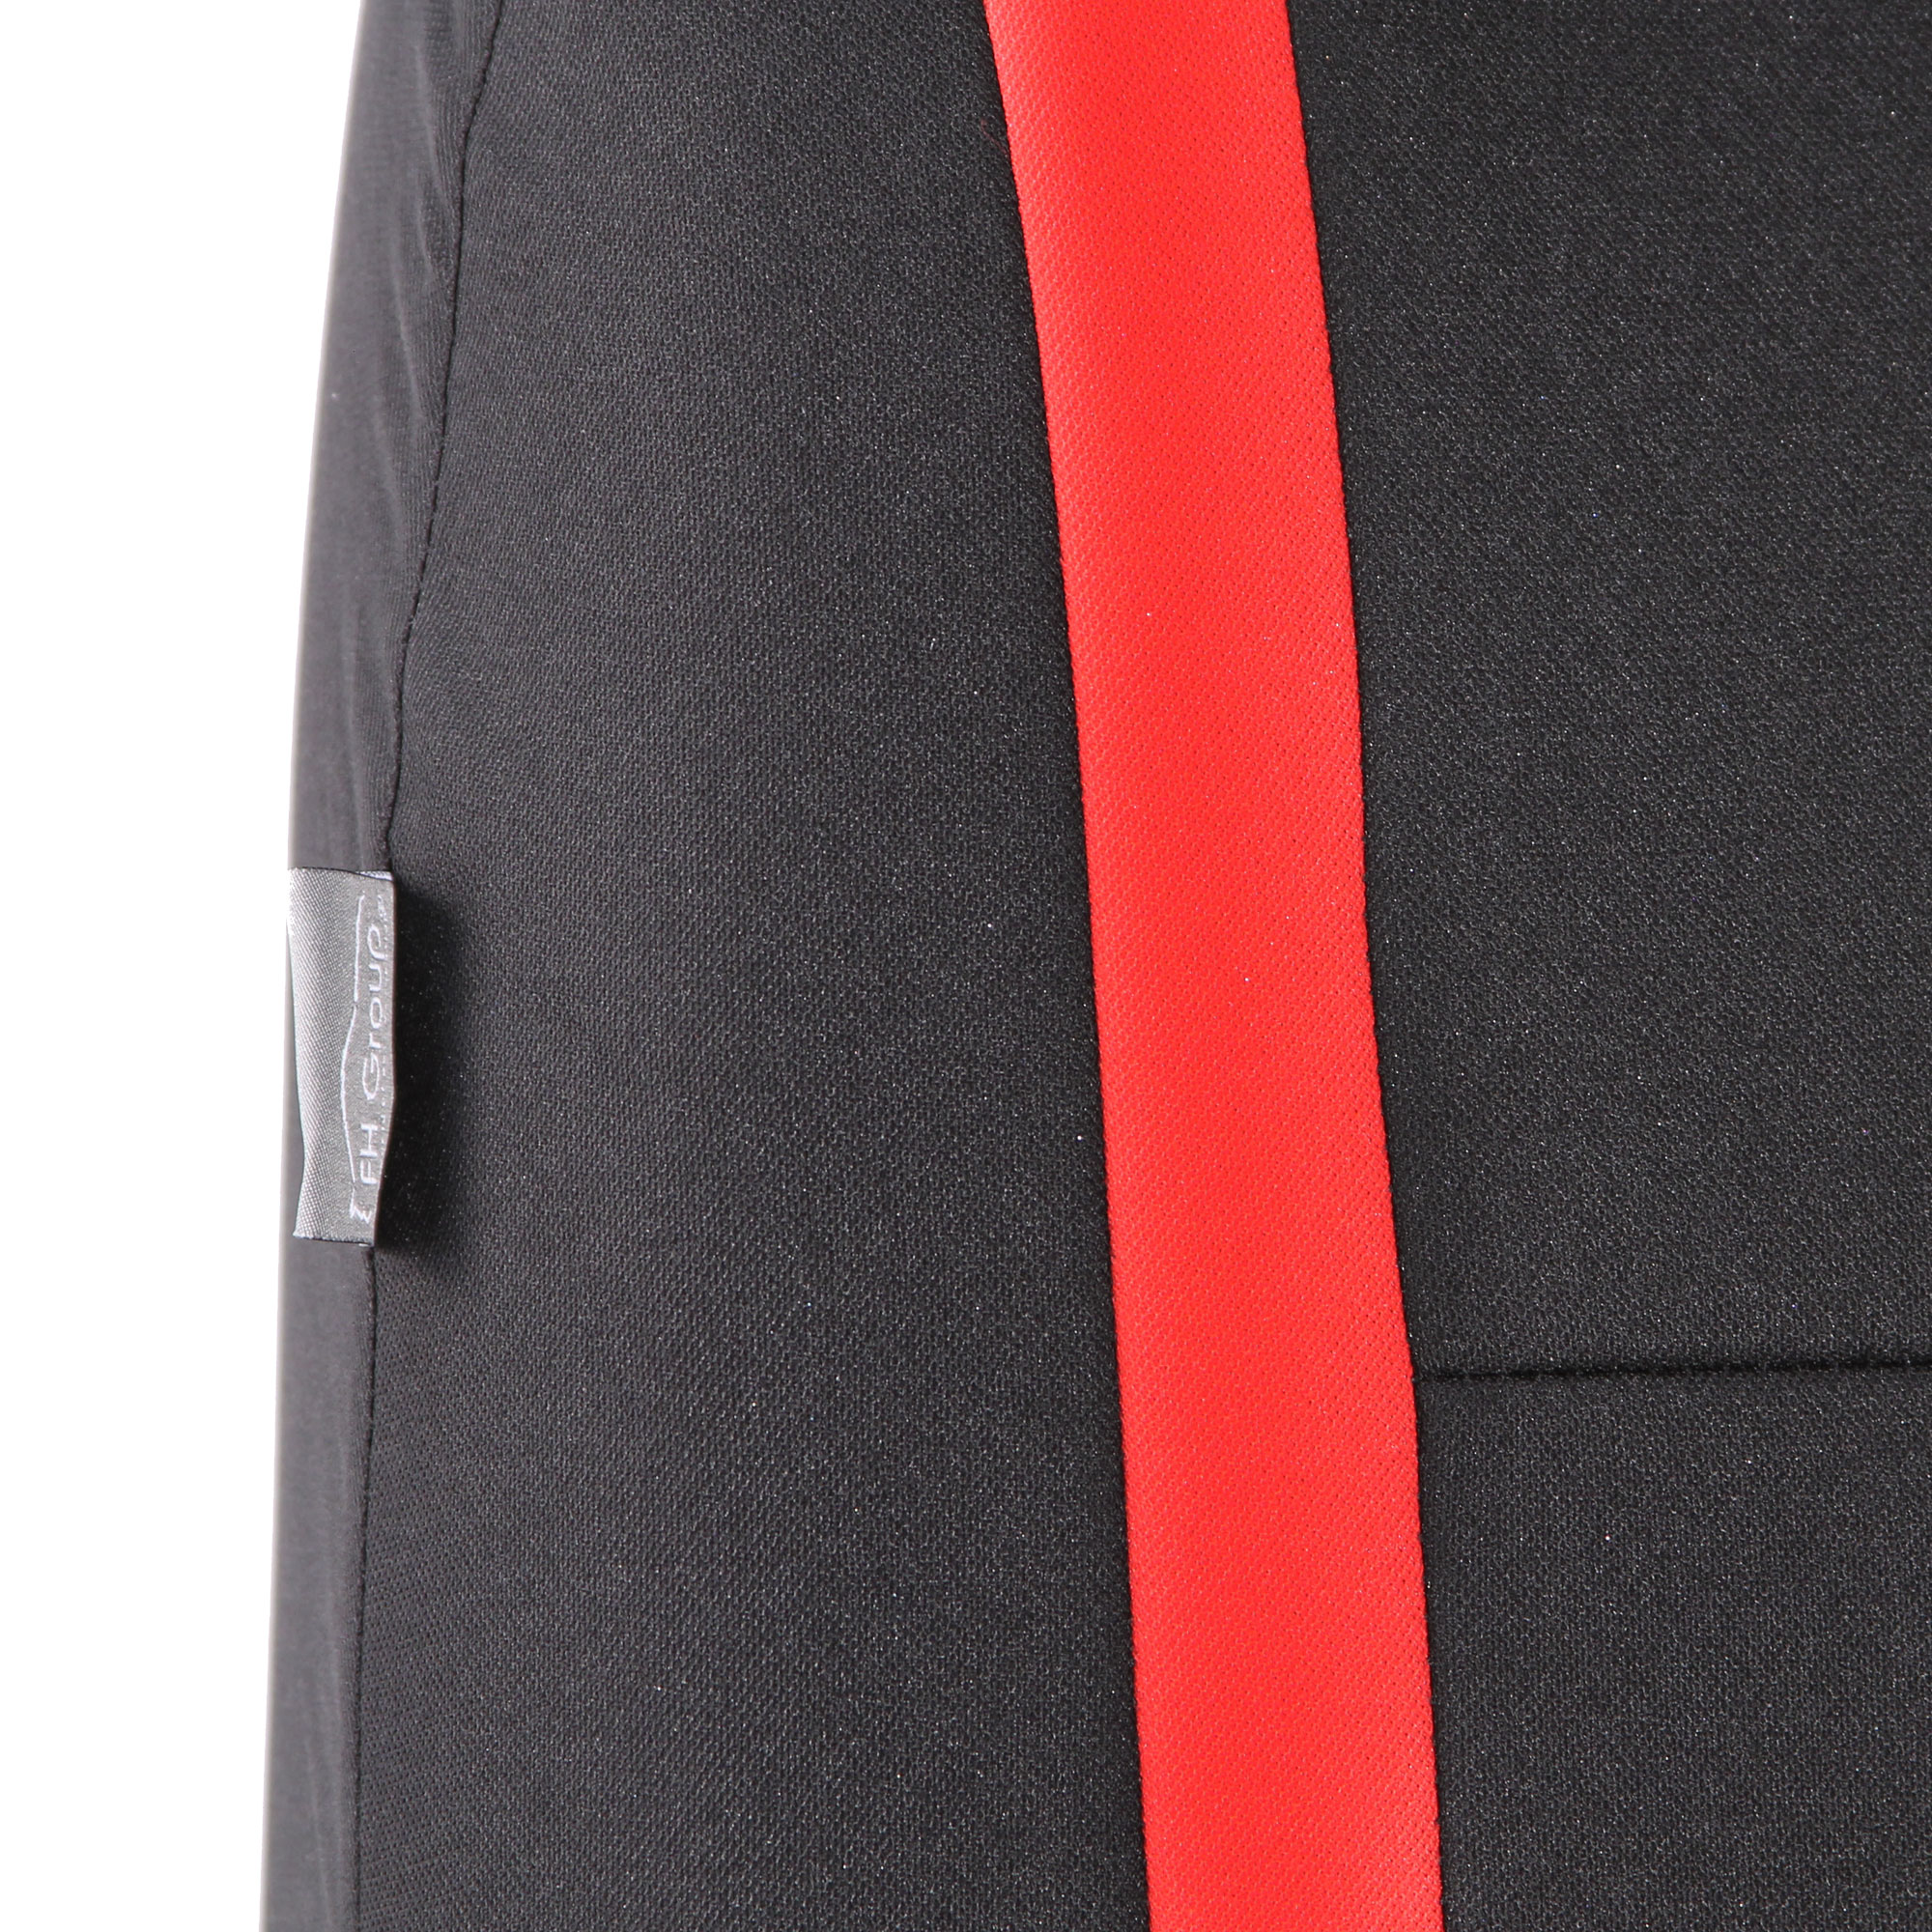 Auto Seat Covers For Car Sedan Truck Van Universal Seat